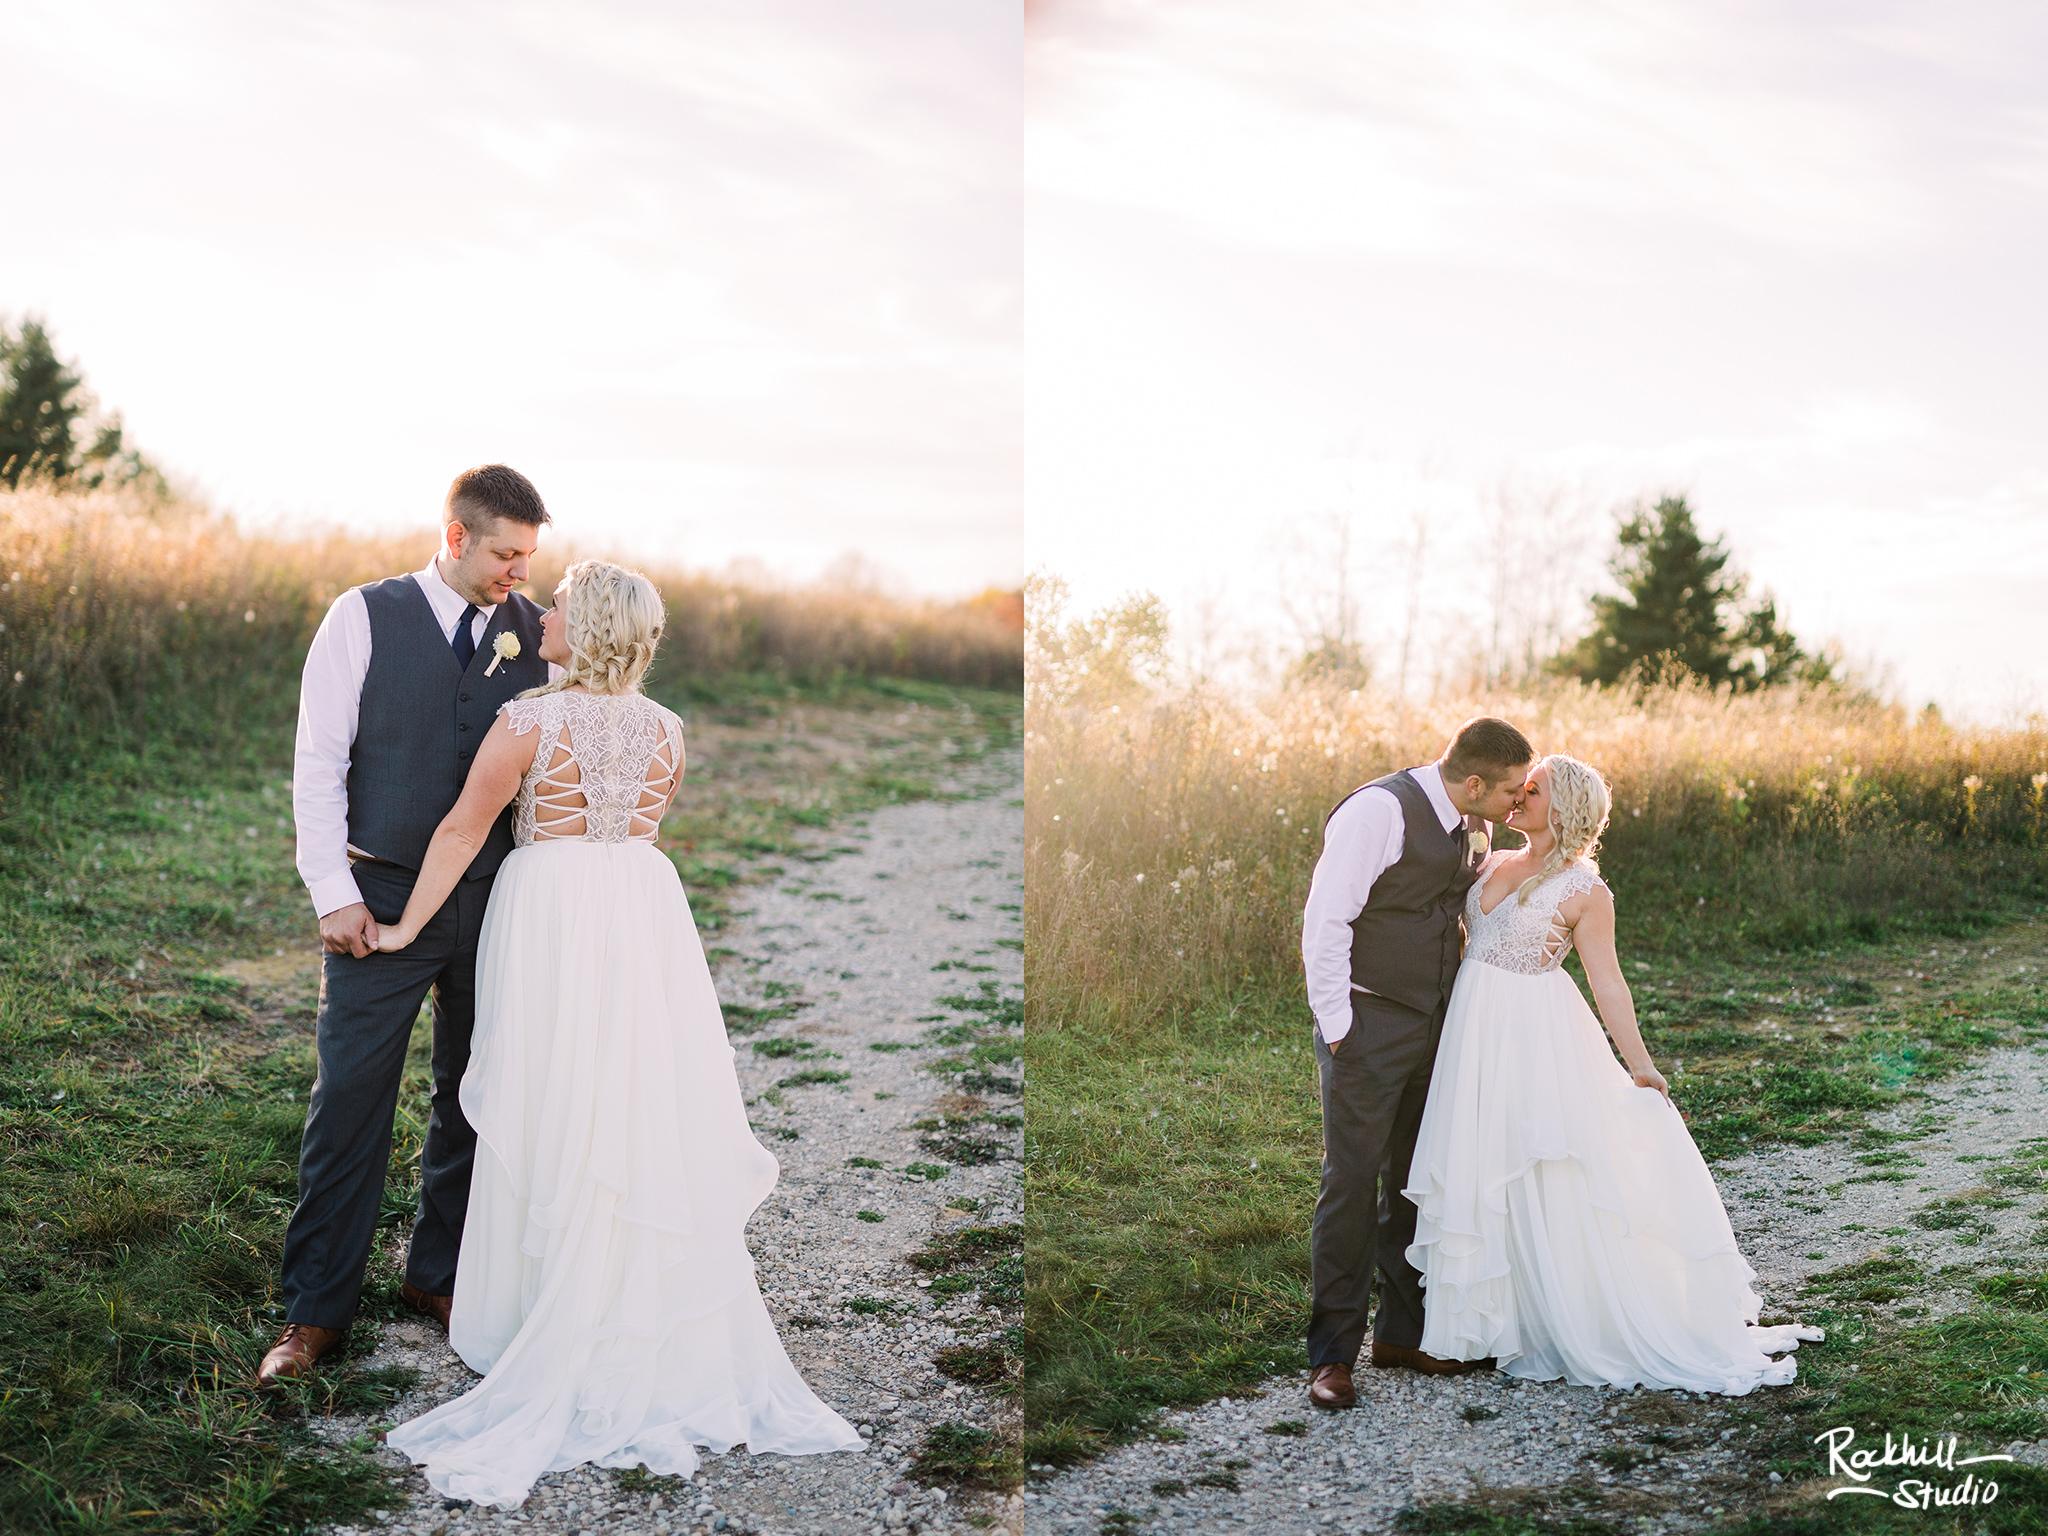 Traverse_city_wedding_photographer_michigan_rockhill_studio_bride_groom_QD_59.jpg